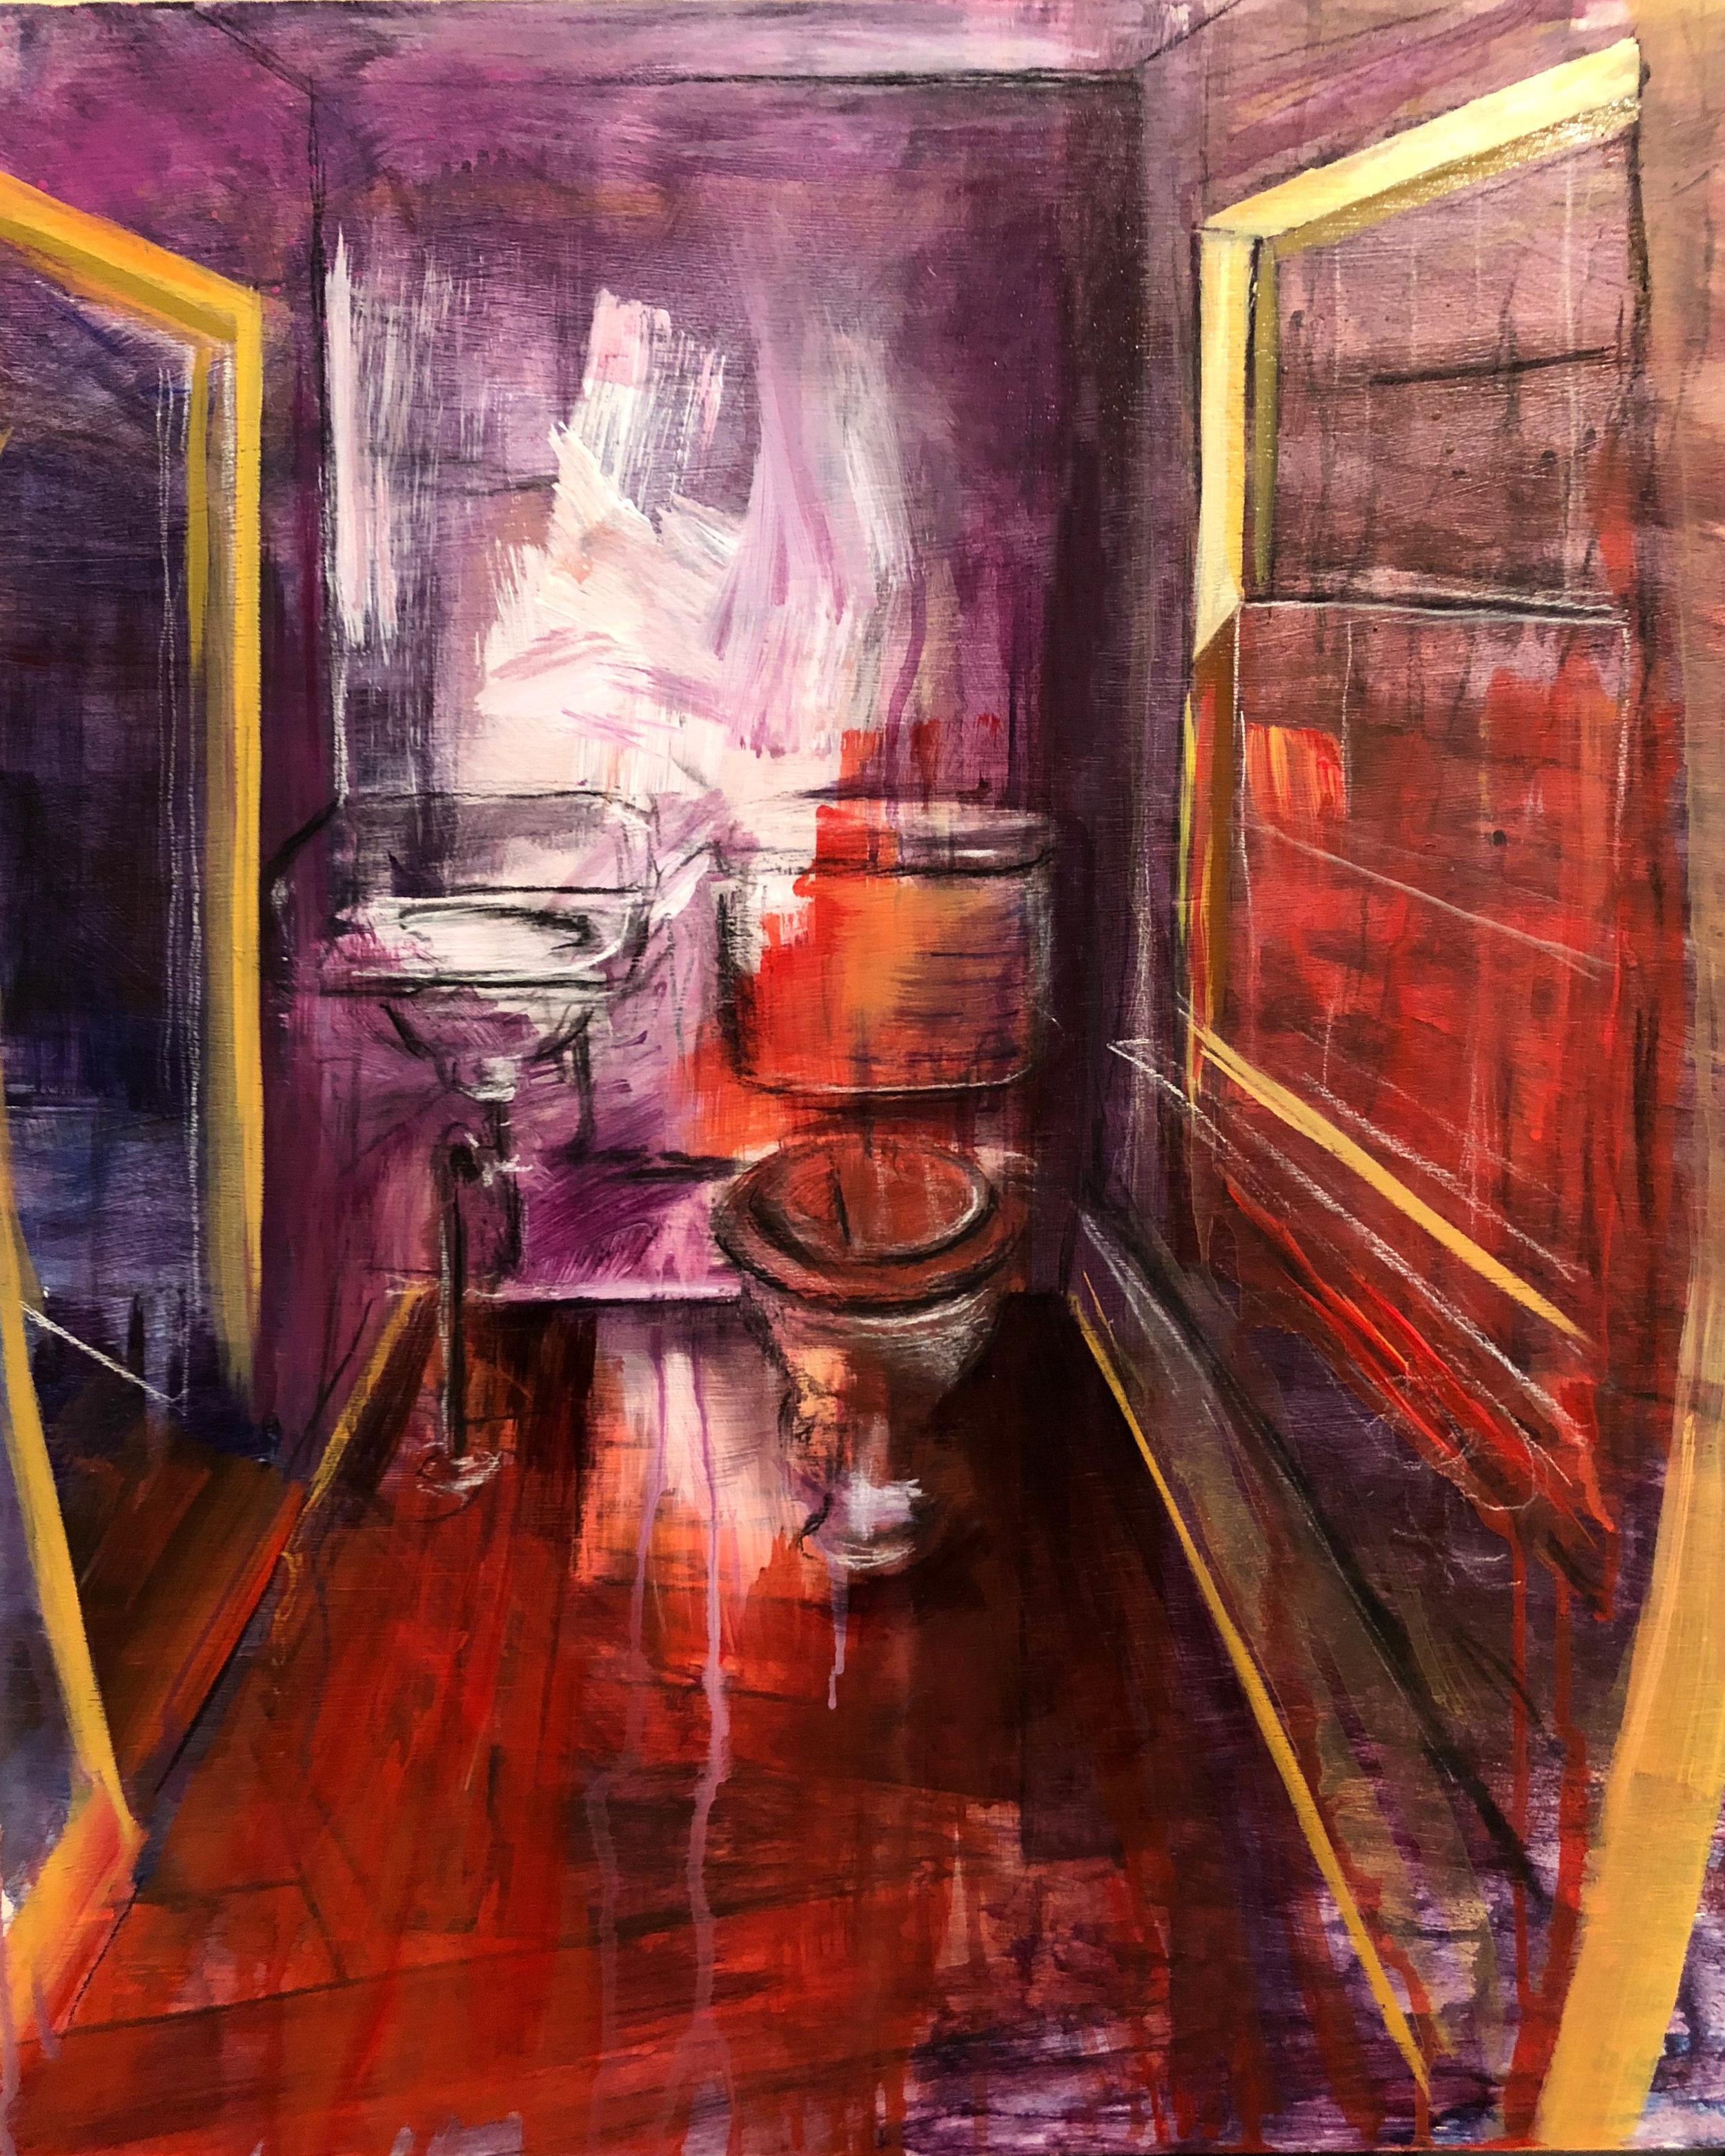 Shaker Bathroom